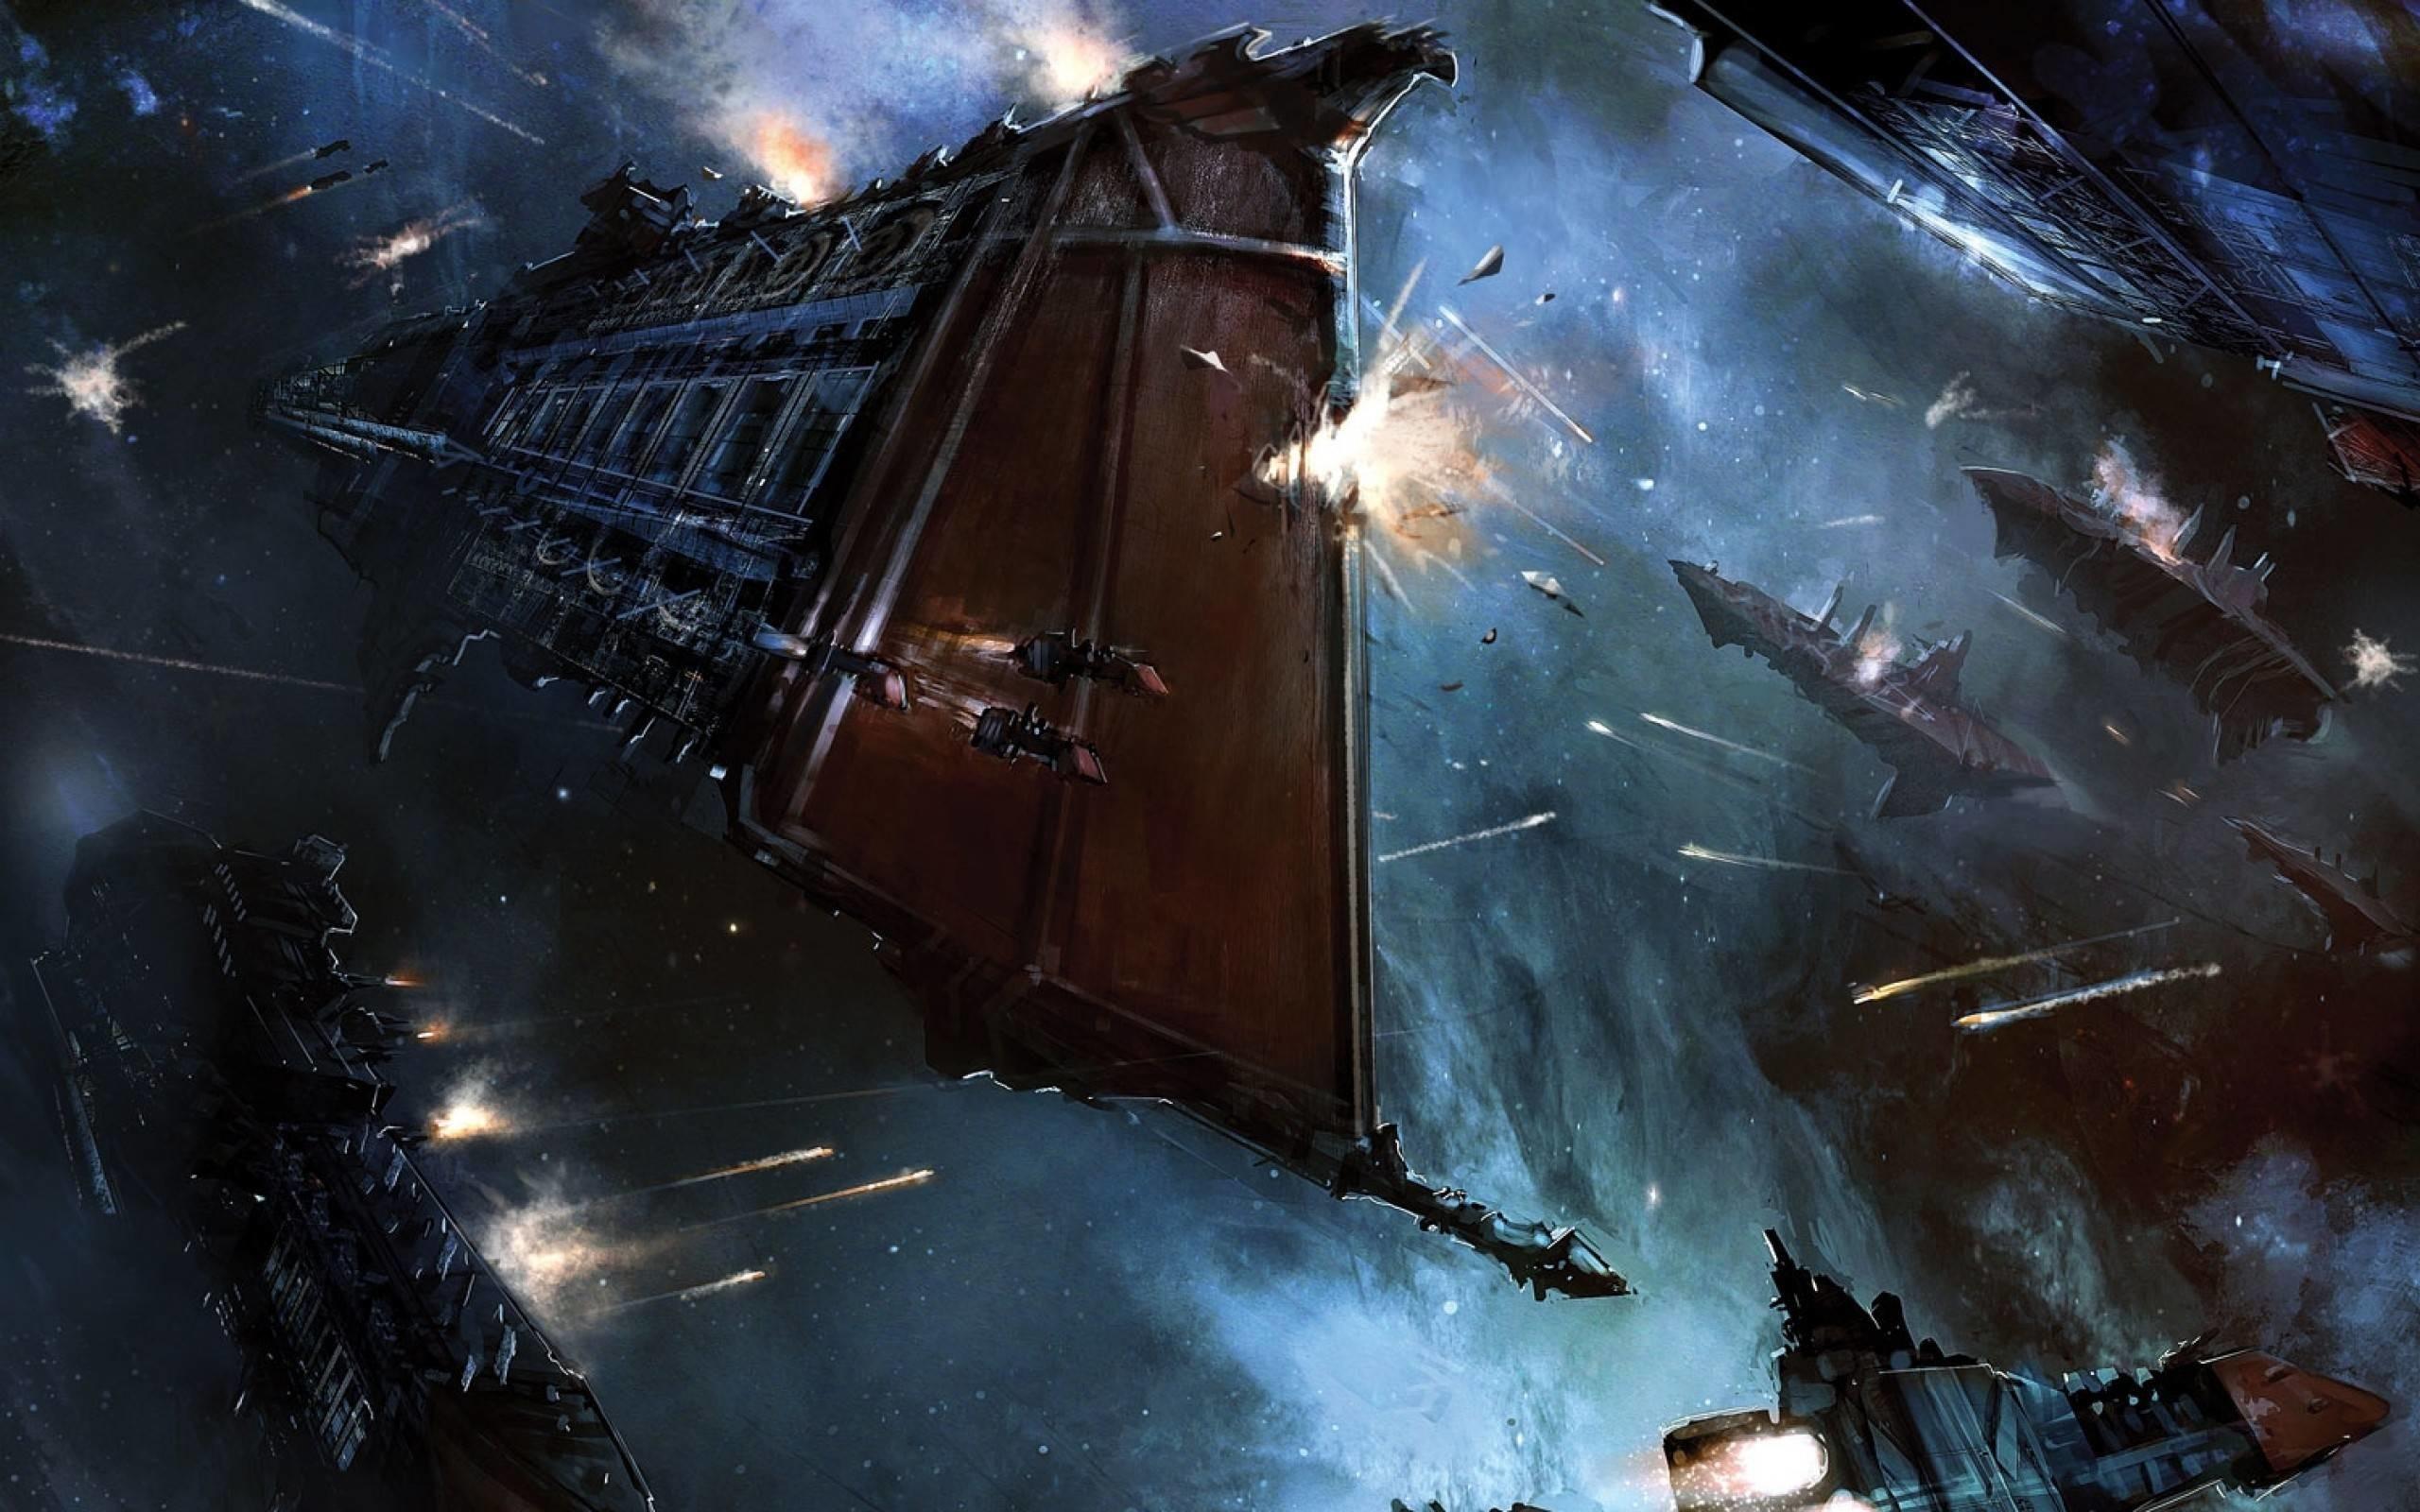 Space Battle Wallpaper Free Download 2560×1600